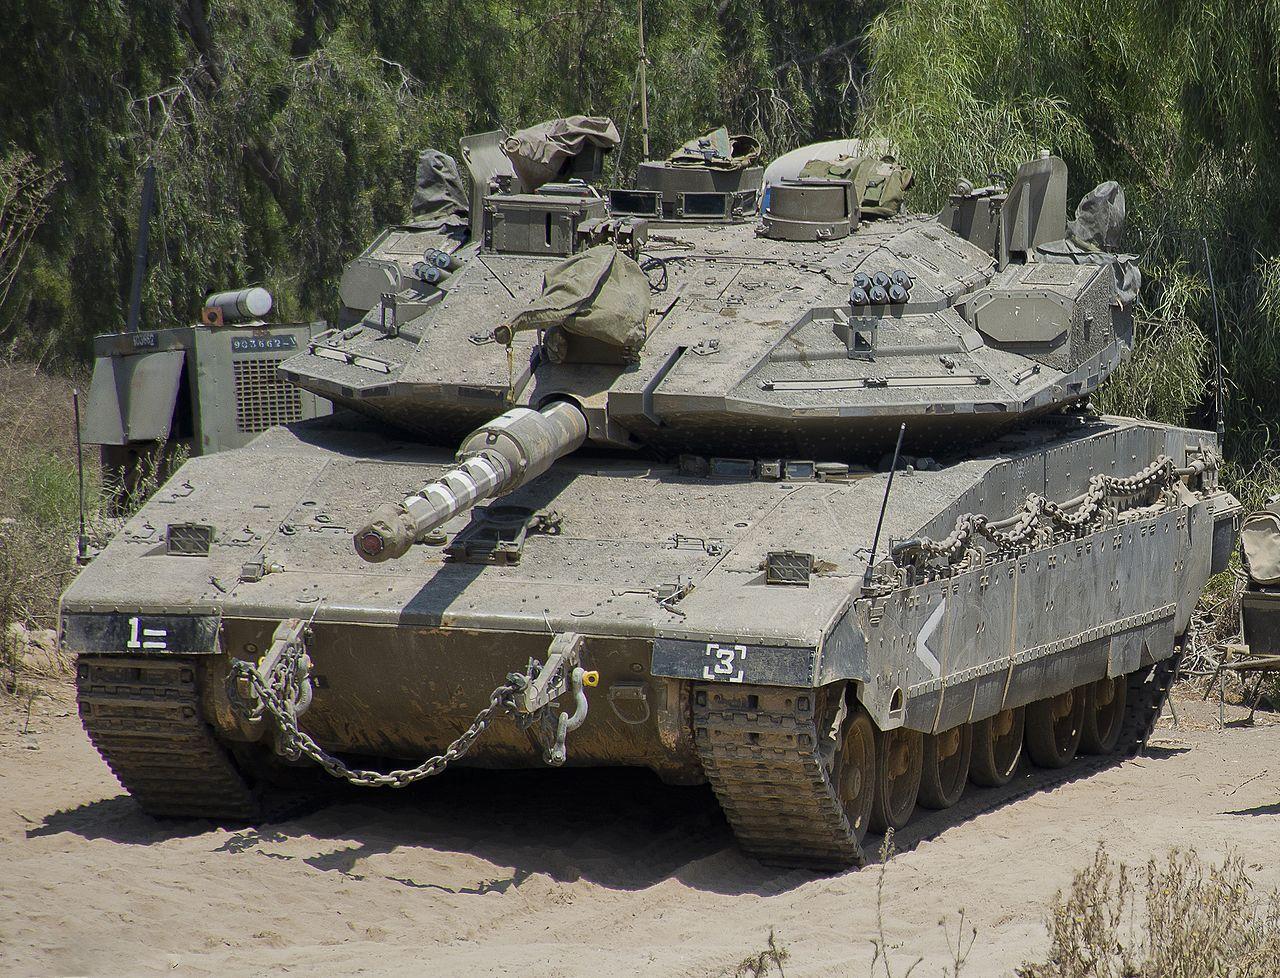 Israeli tank Merkava-4: characteristics, photo 74